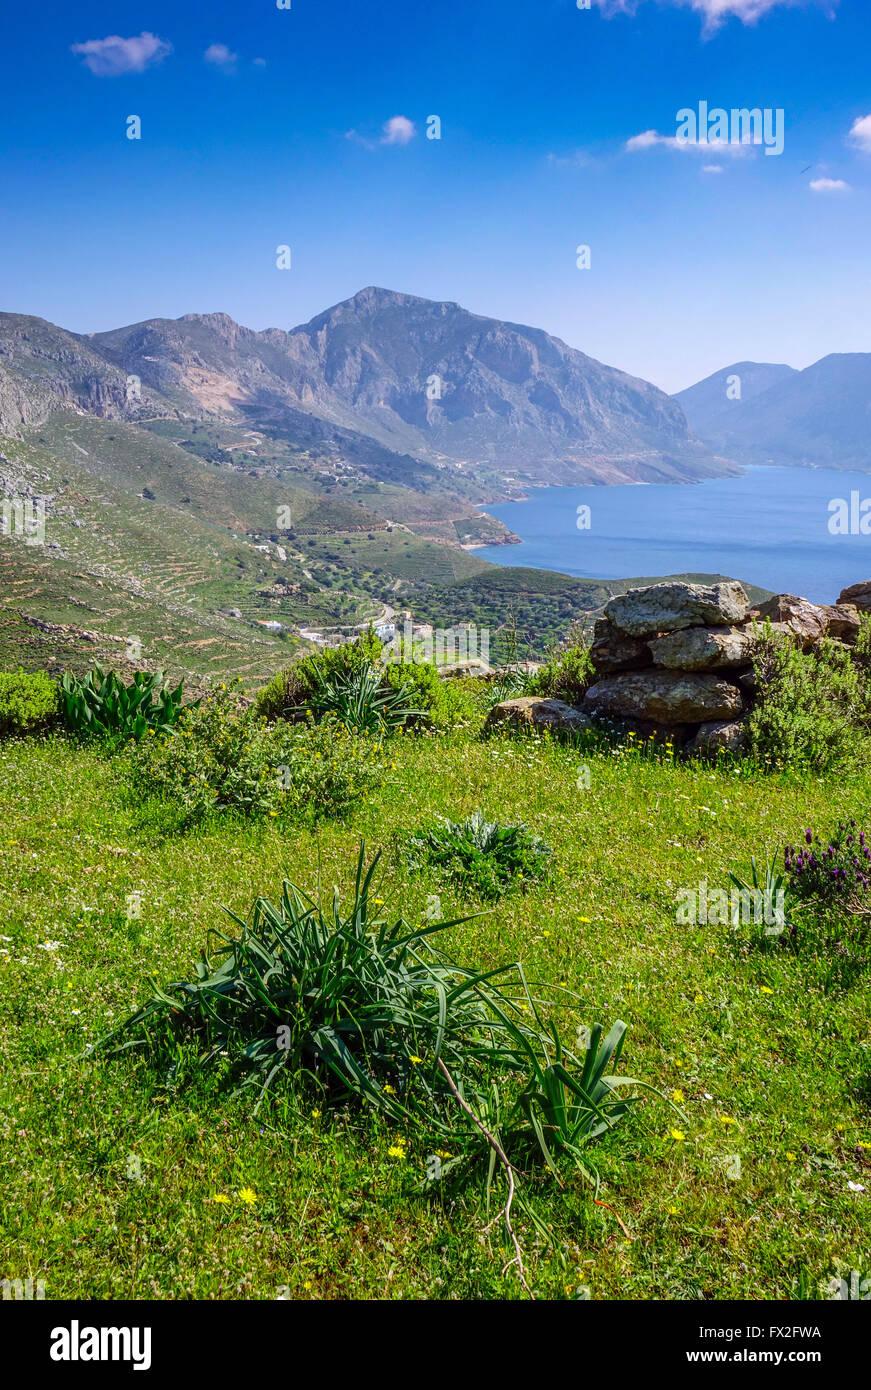 Blue sea spring greenery and mountains at Emborios Bay Kalymnos, Greece - Stock Image